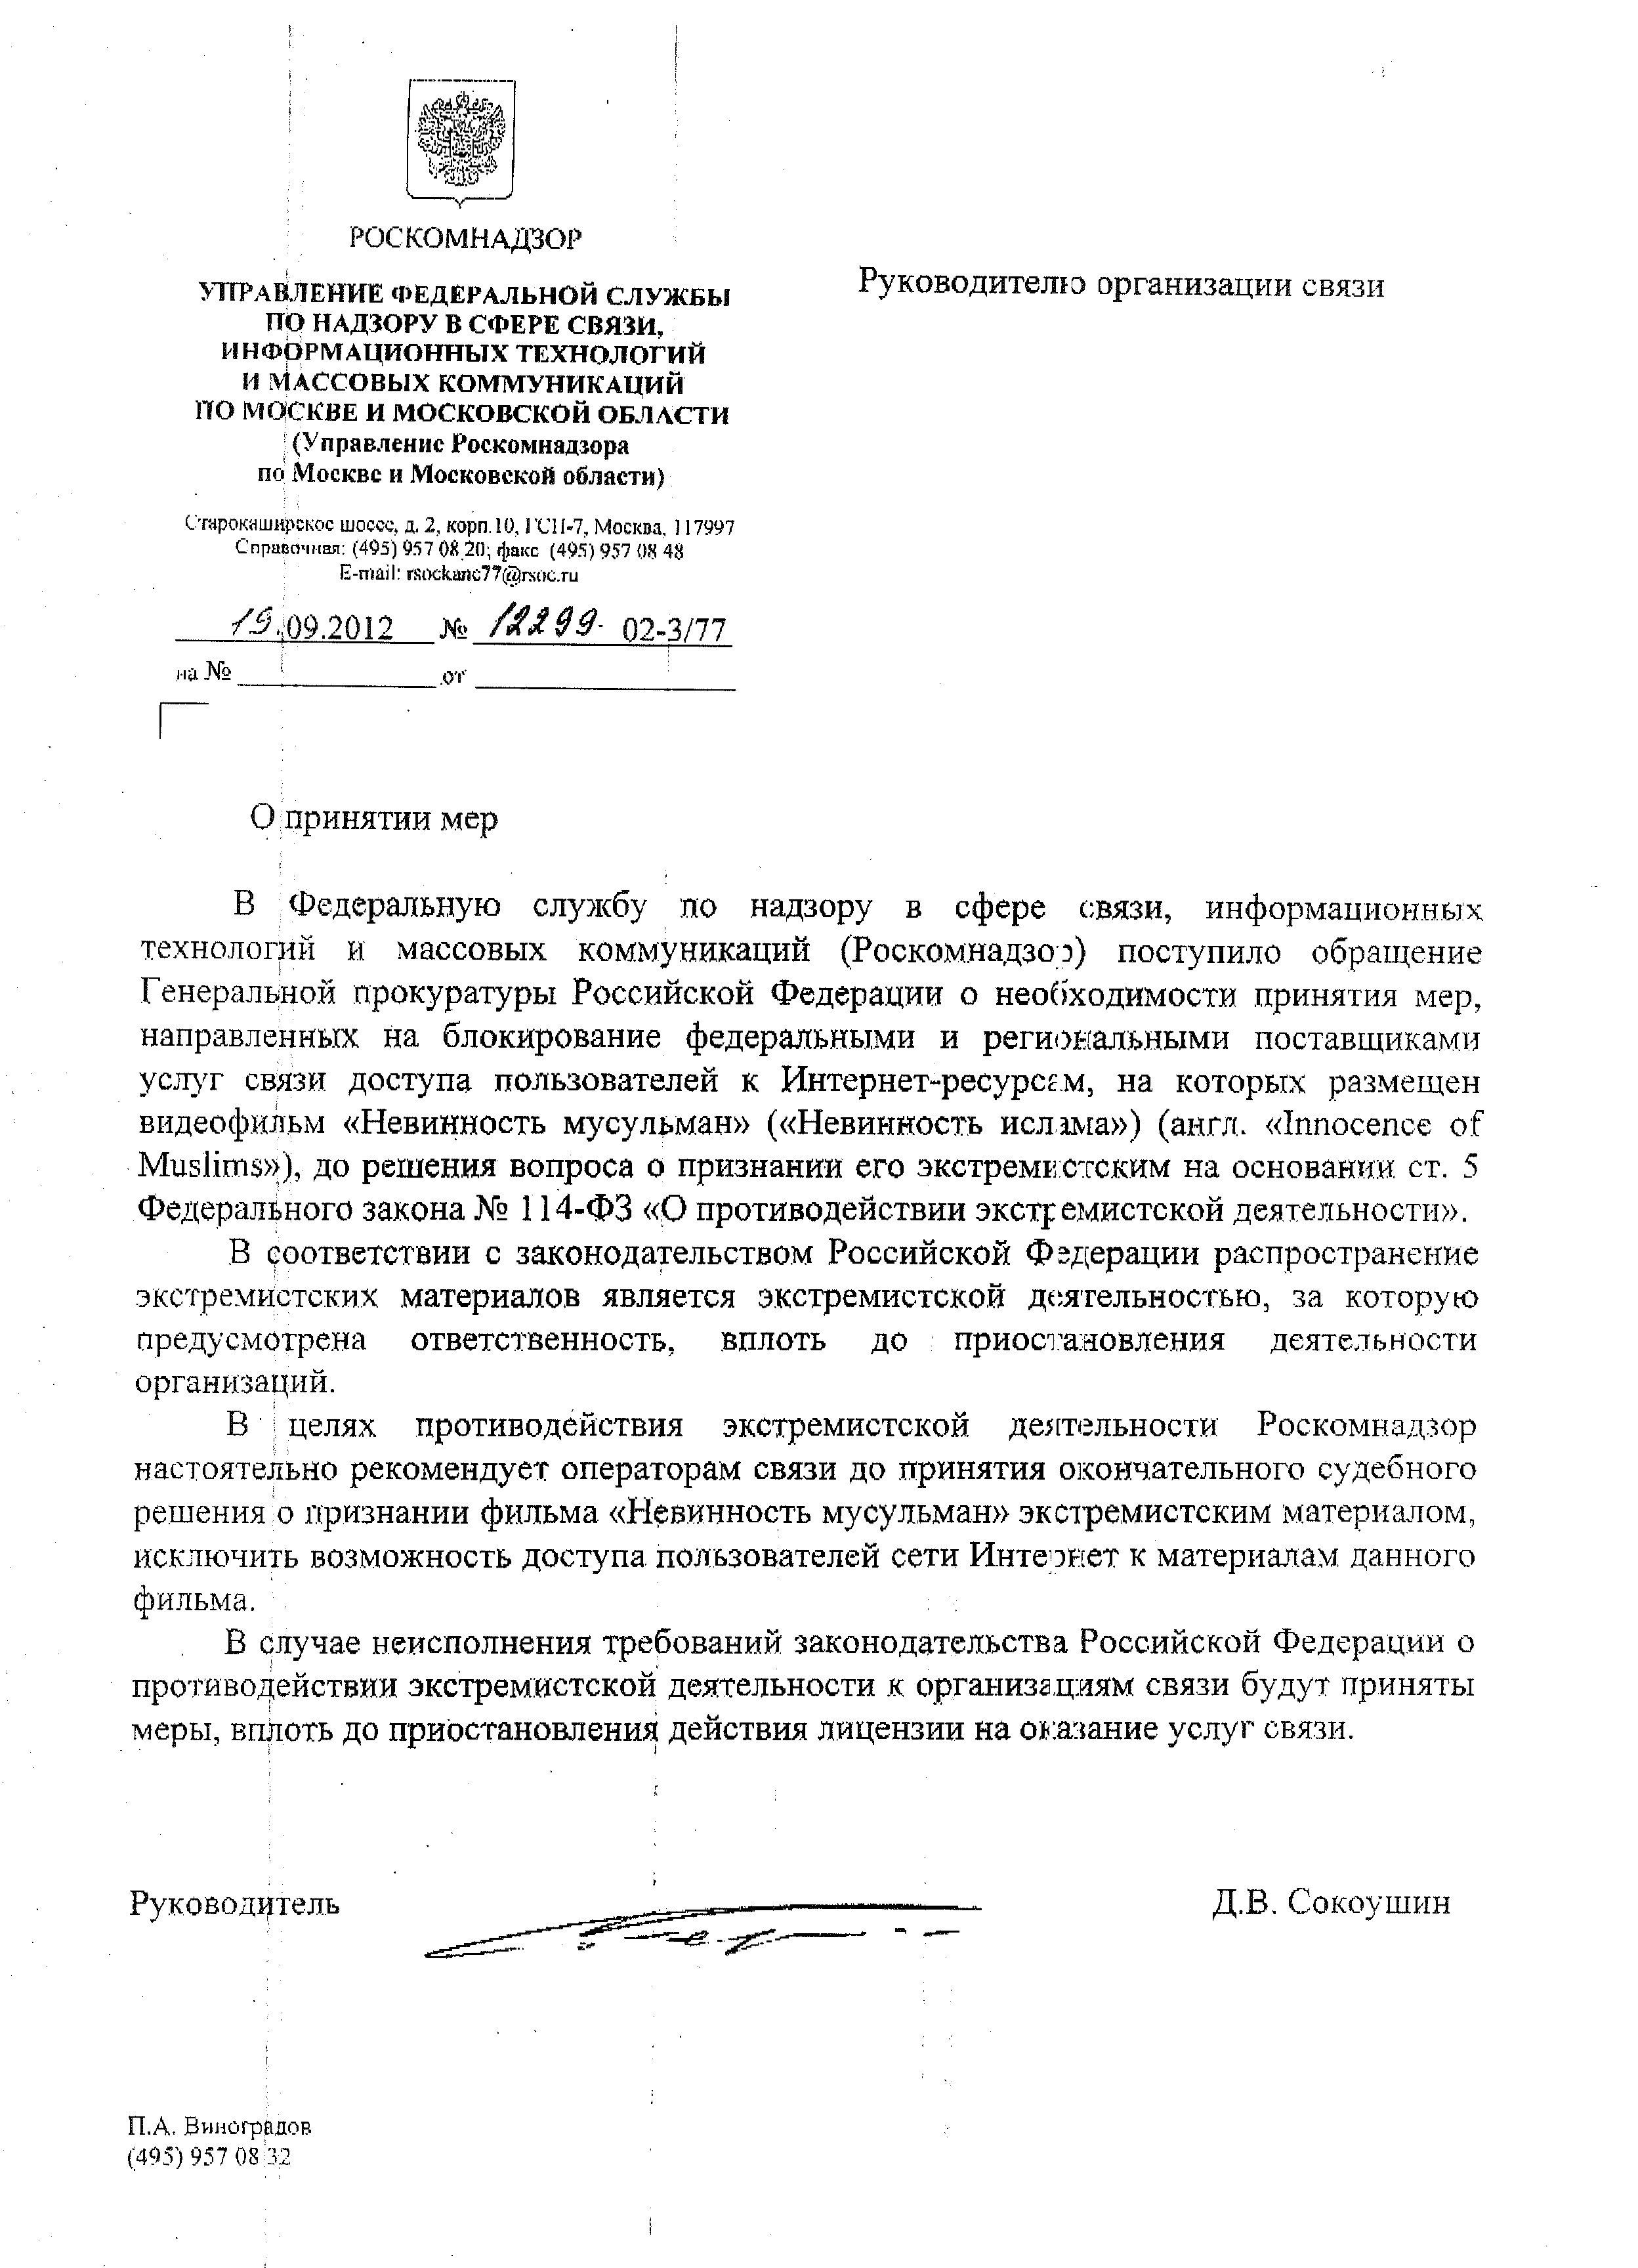 http://forum.darnet.ru/img_attach/1253.jpg